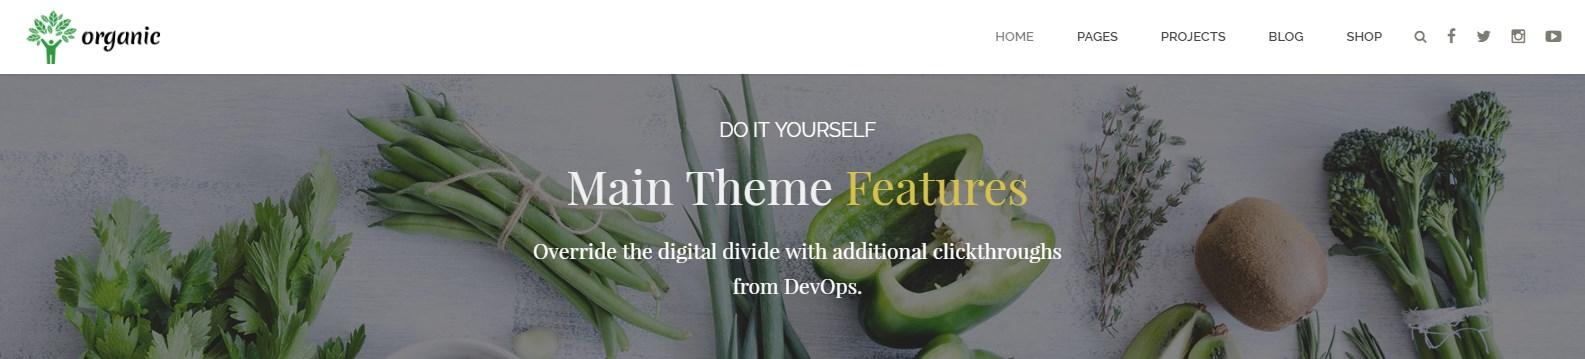 https://documentation.bold-themes.com/organic-food/wp-content/uploads/sites/6/2016/07/32-1.jpg